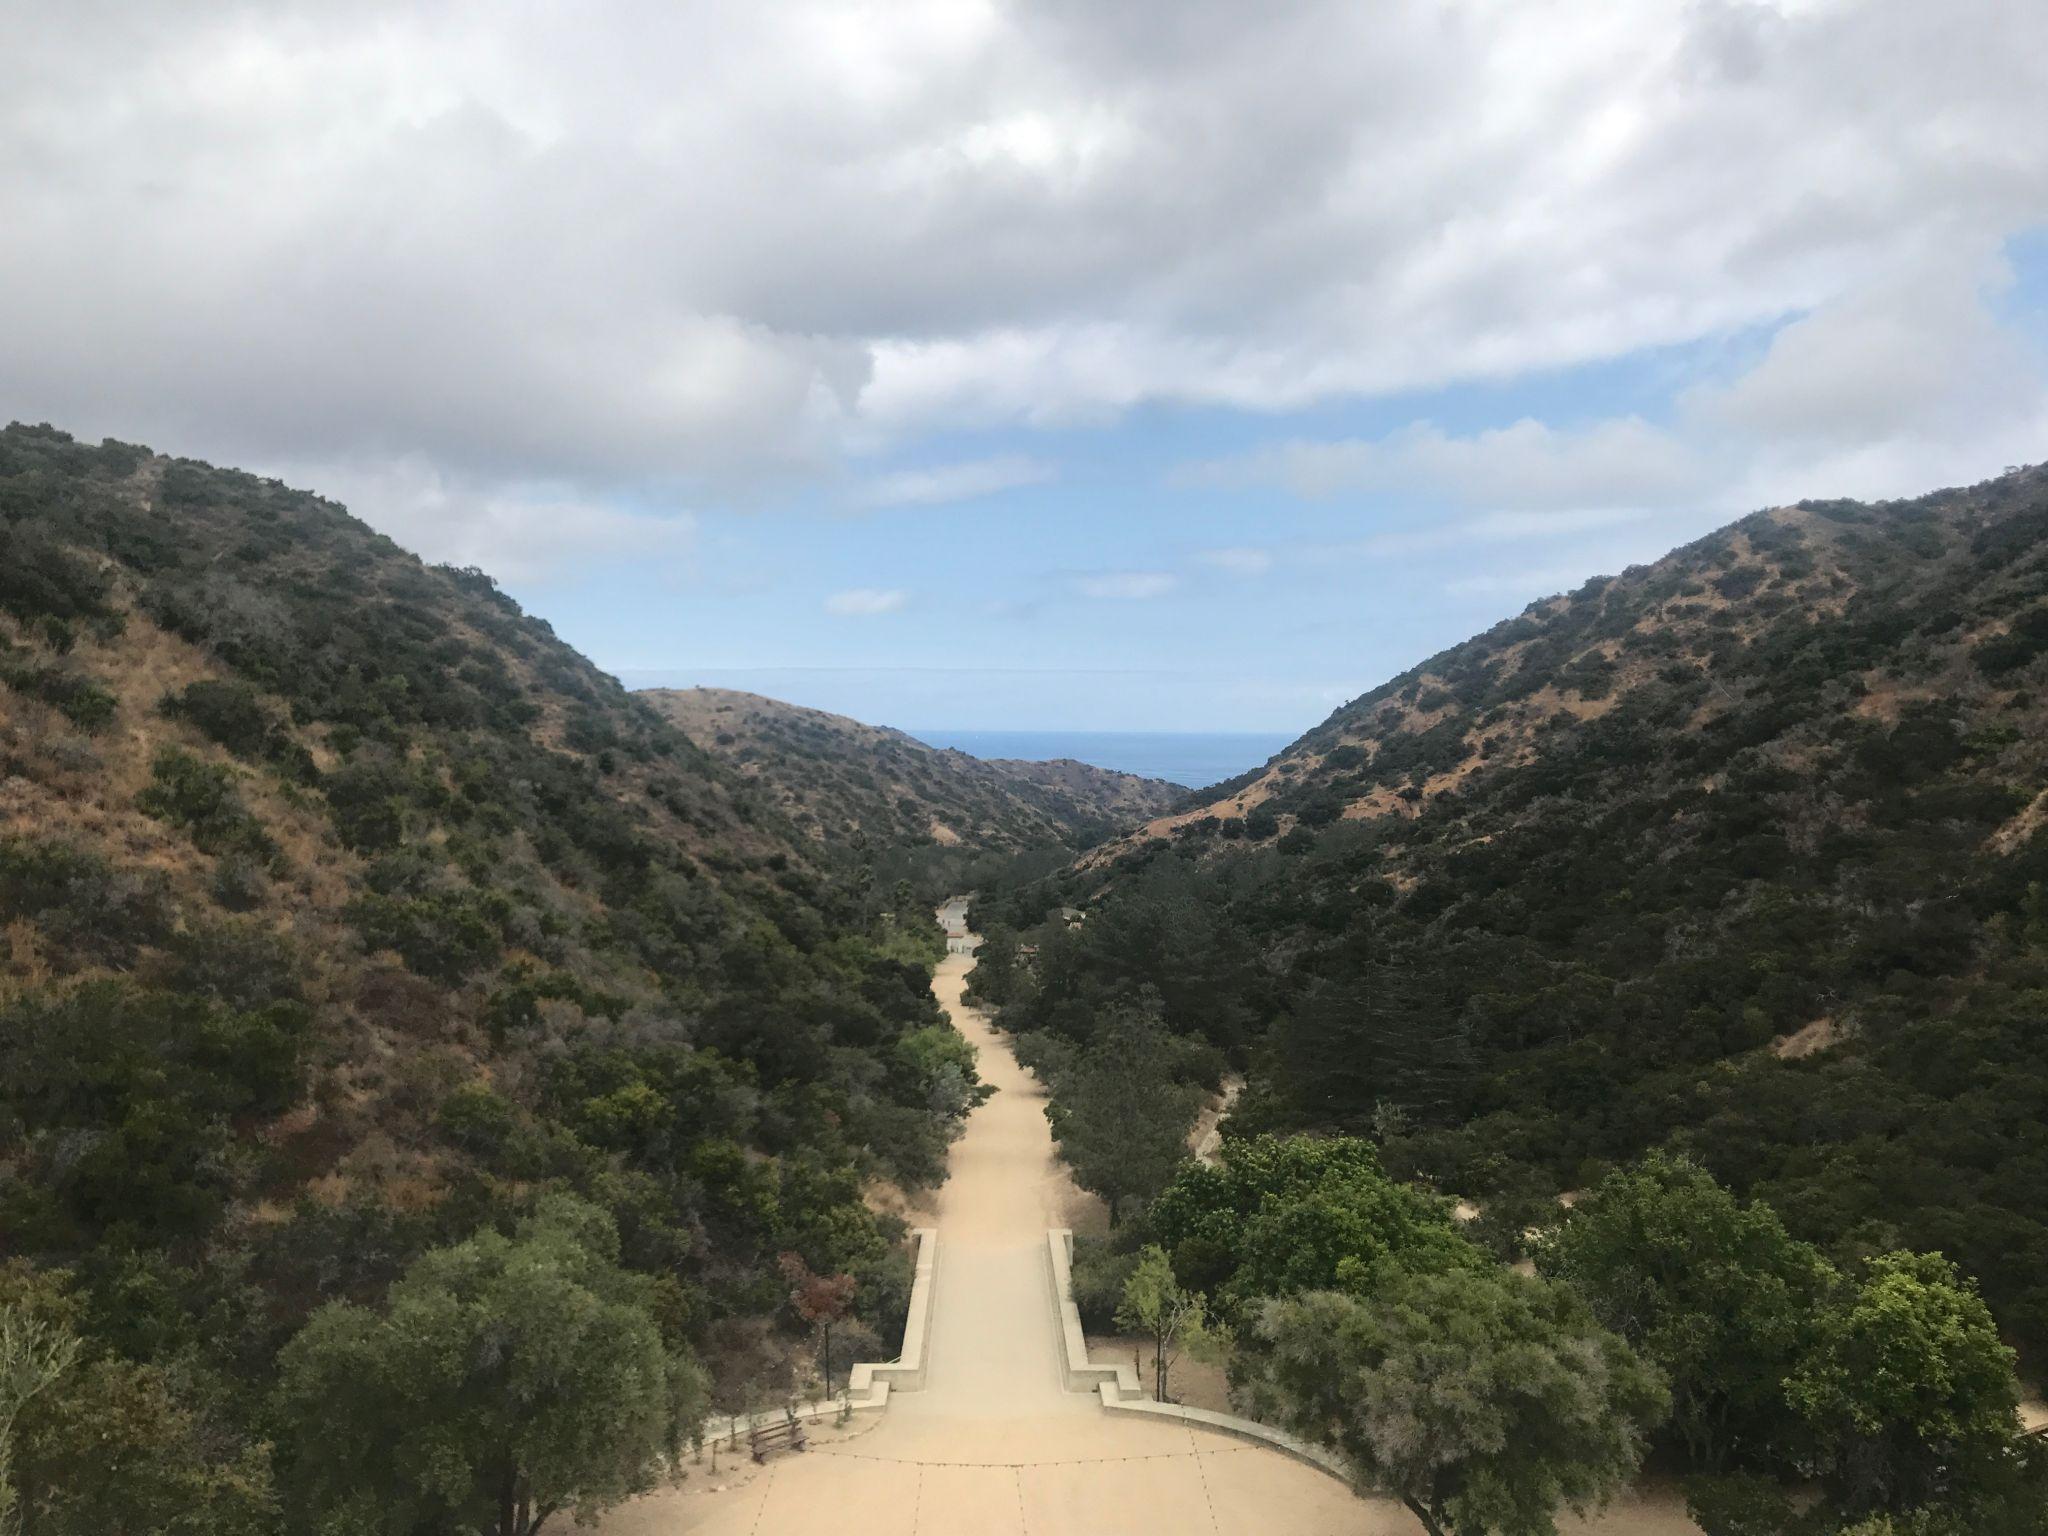 Wrigley Memorial Catalina Island